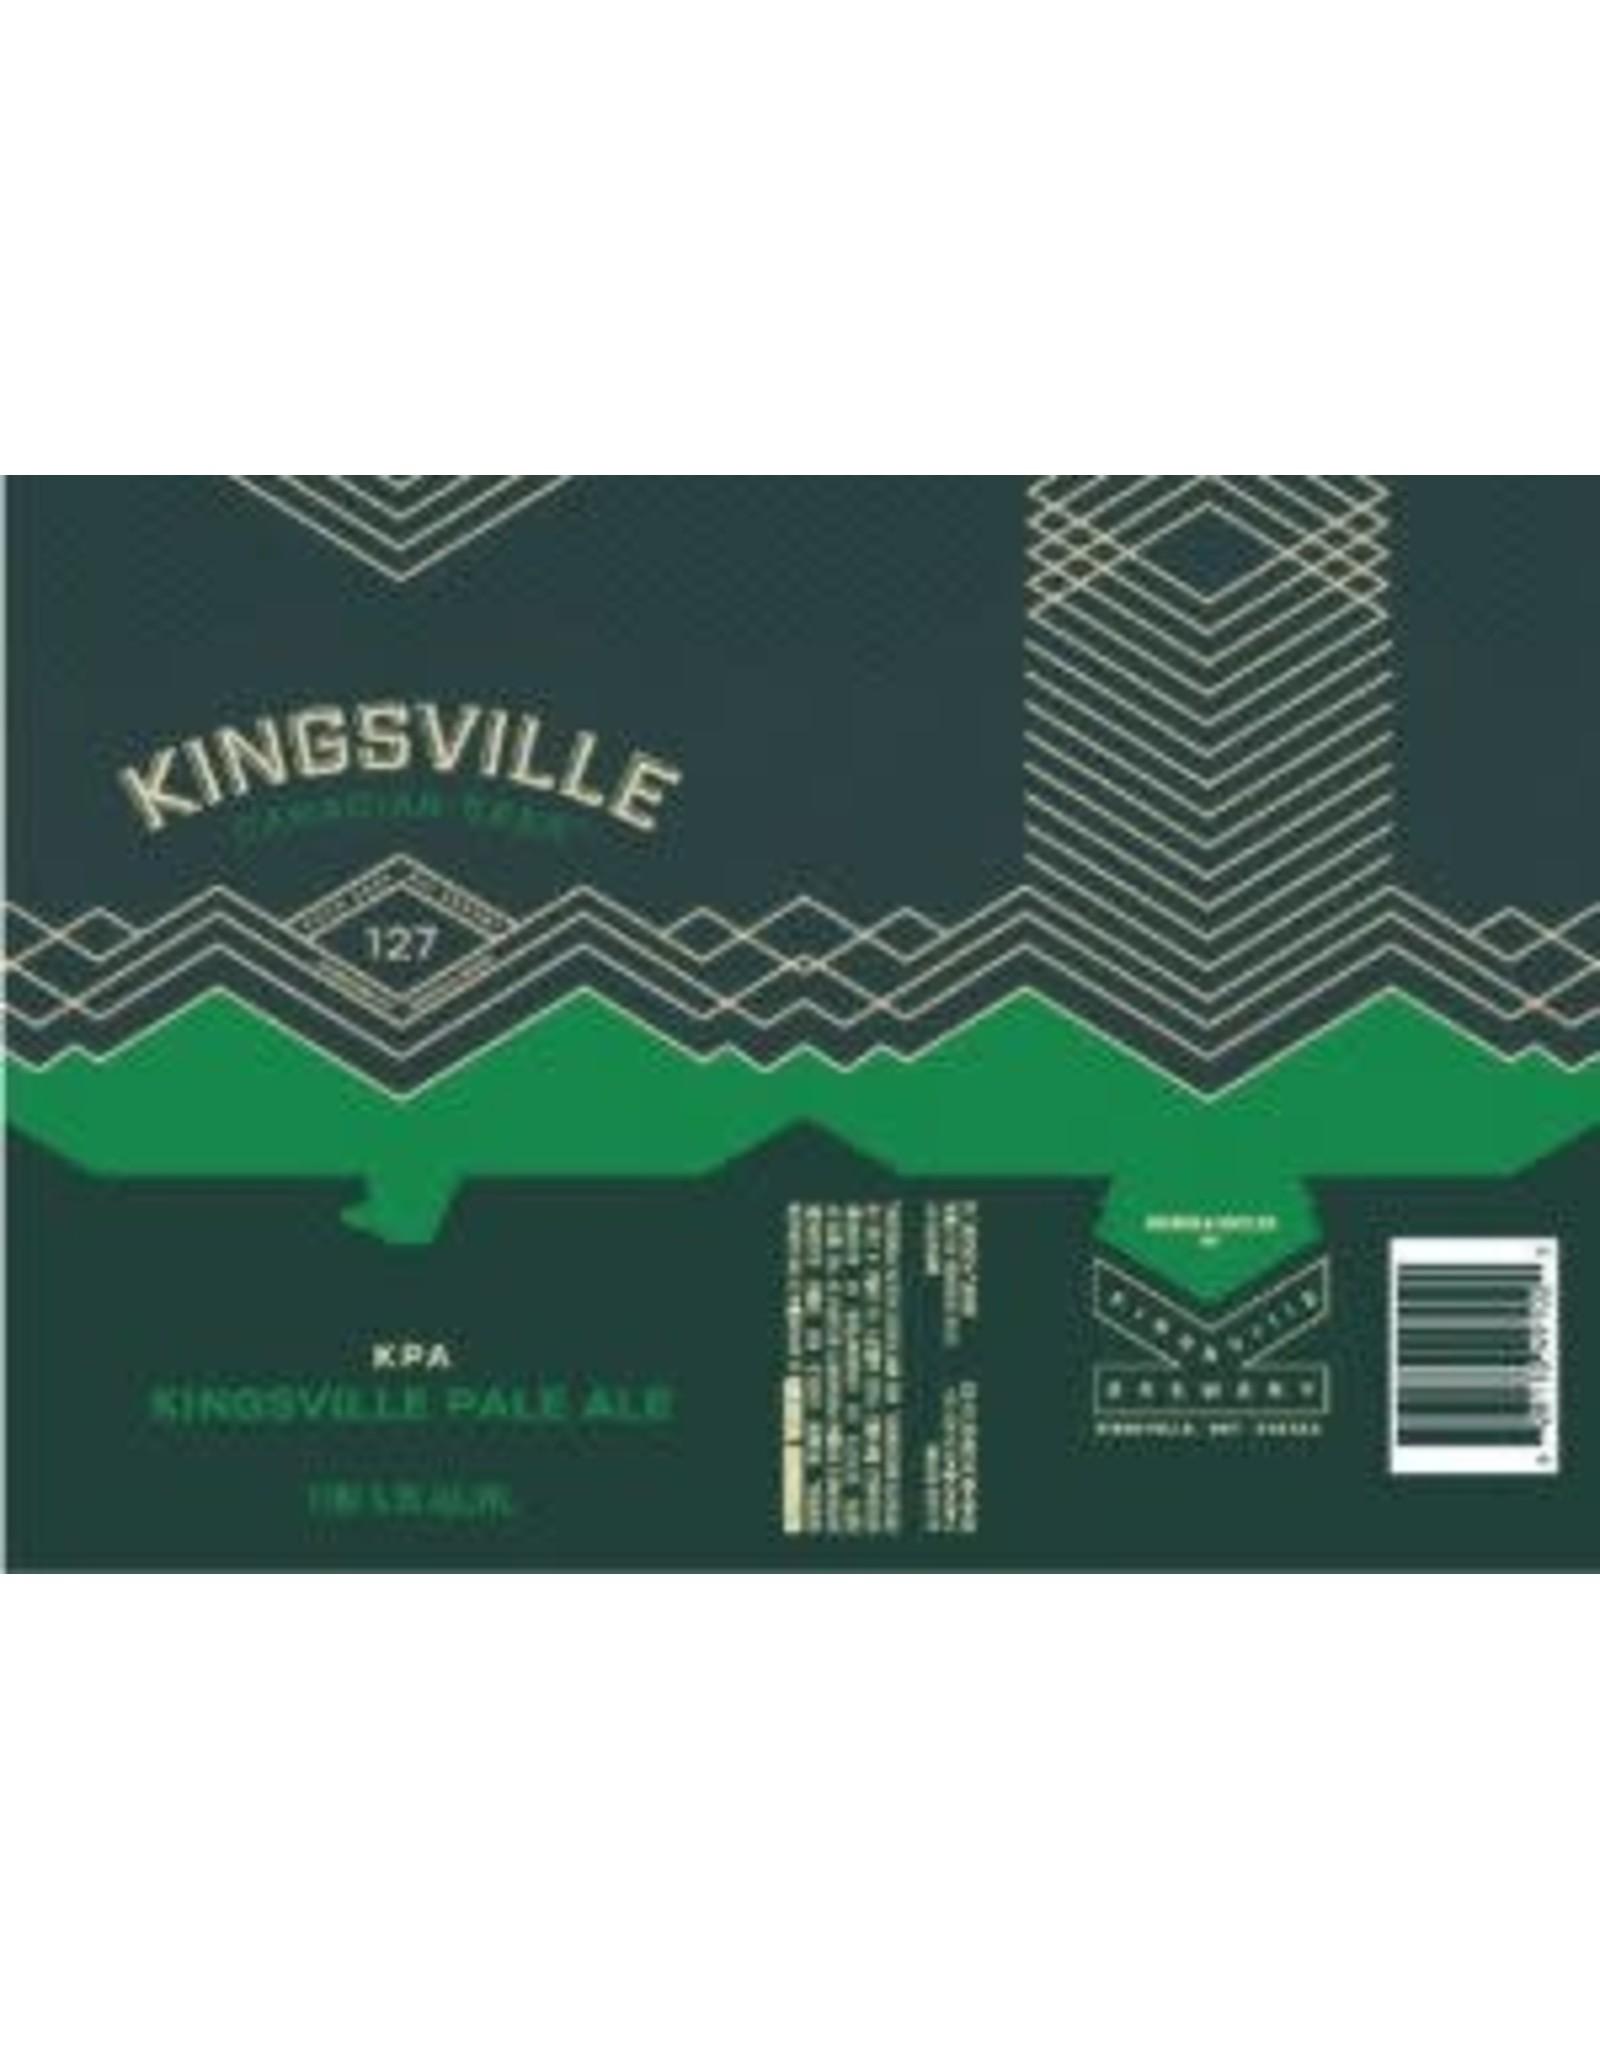 KINGSVILLE PALE ALE  6/4/16CN